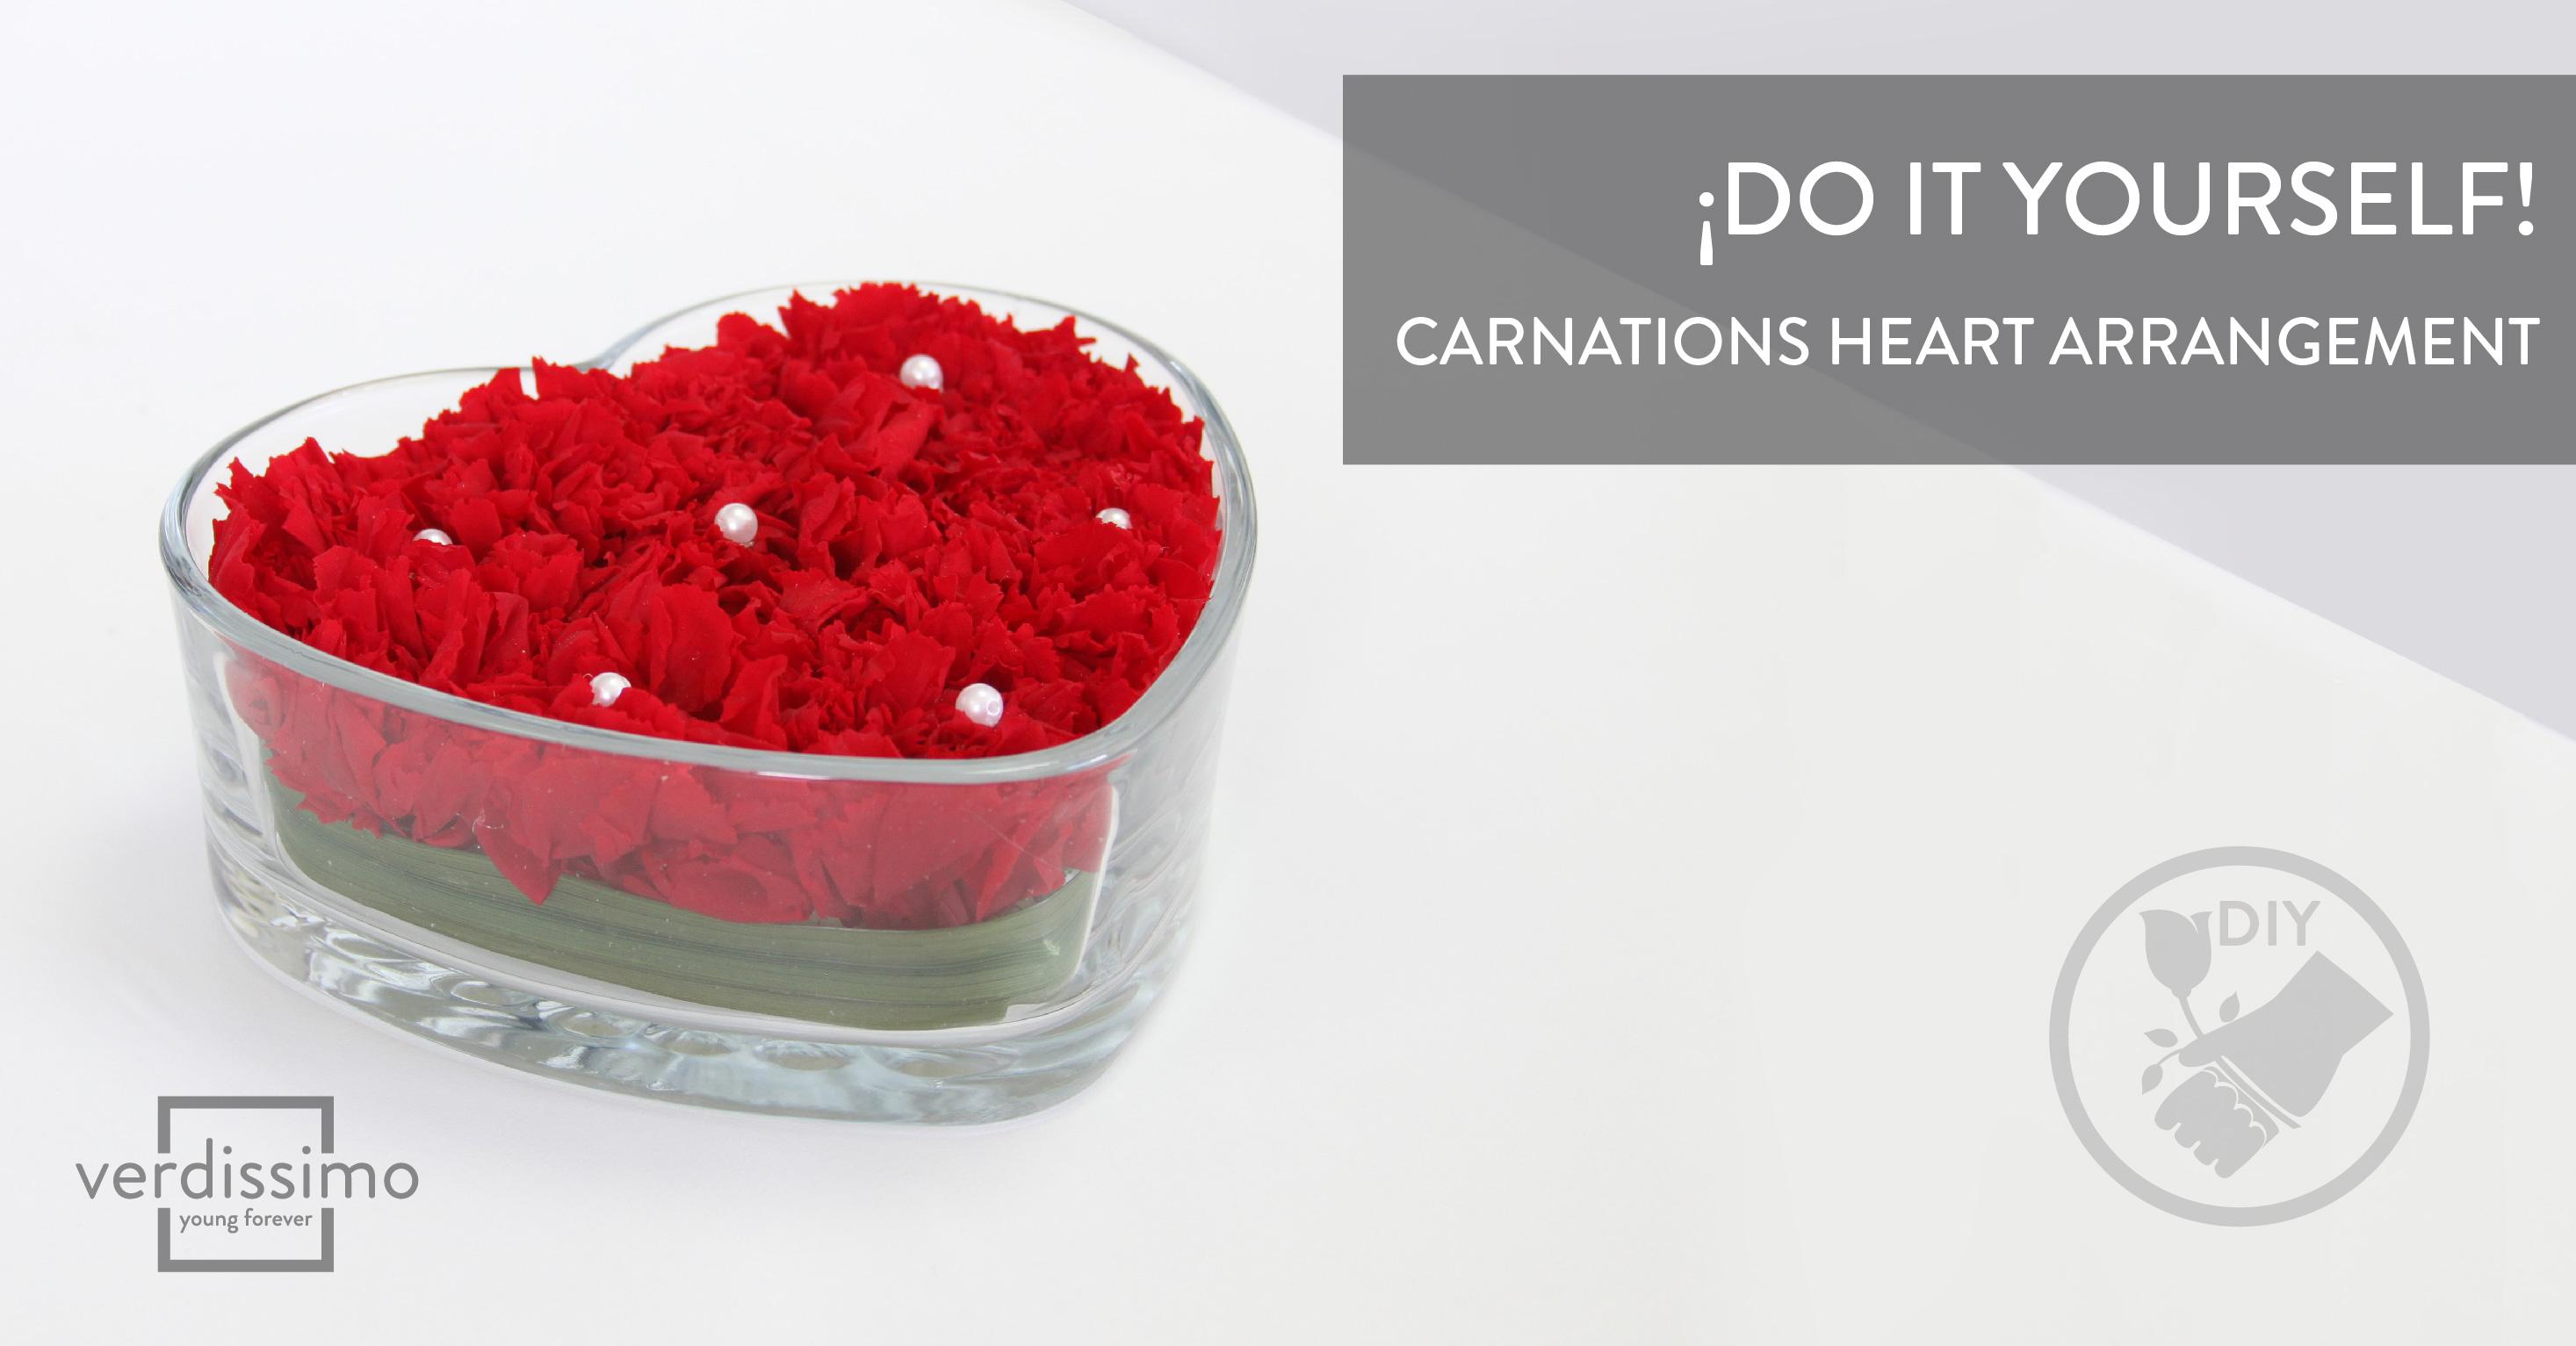 Do it yourself! – Carnations heart arrangement - Verdissimo